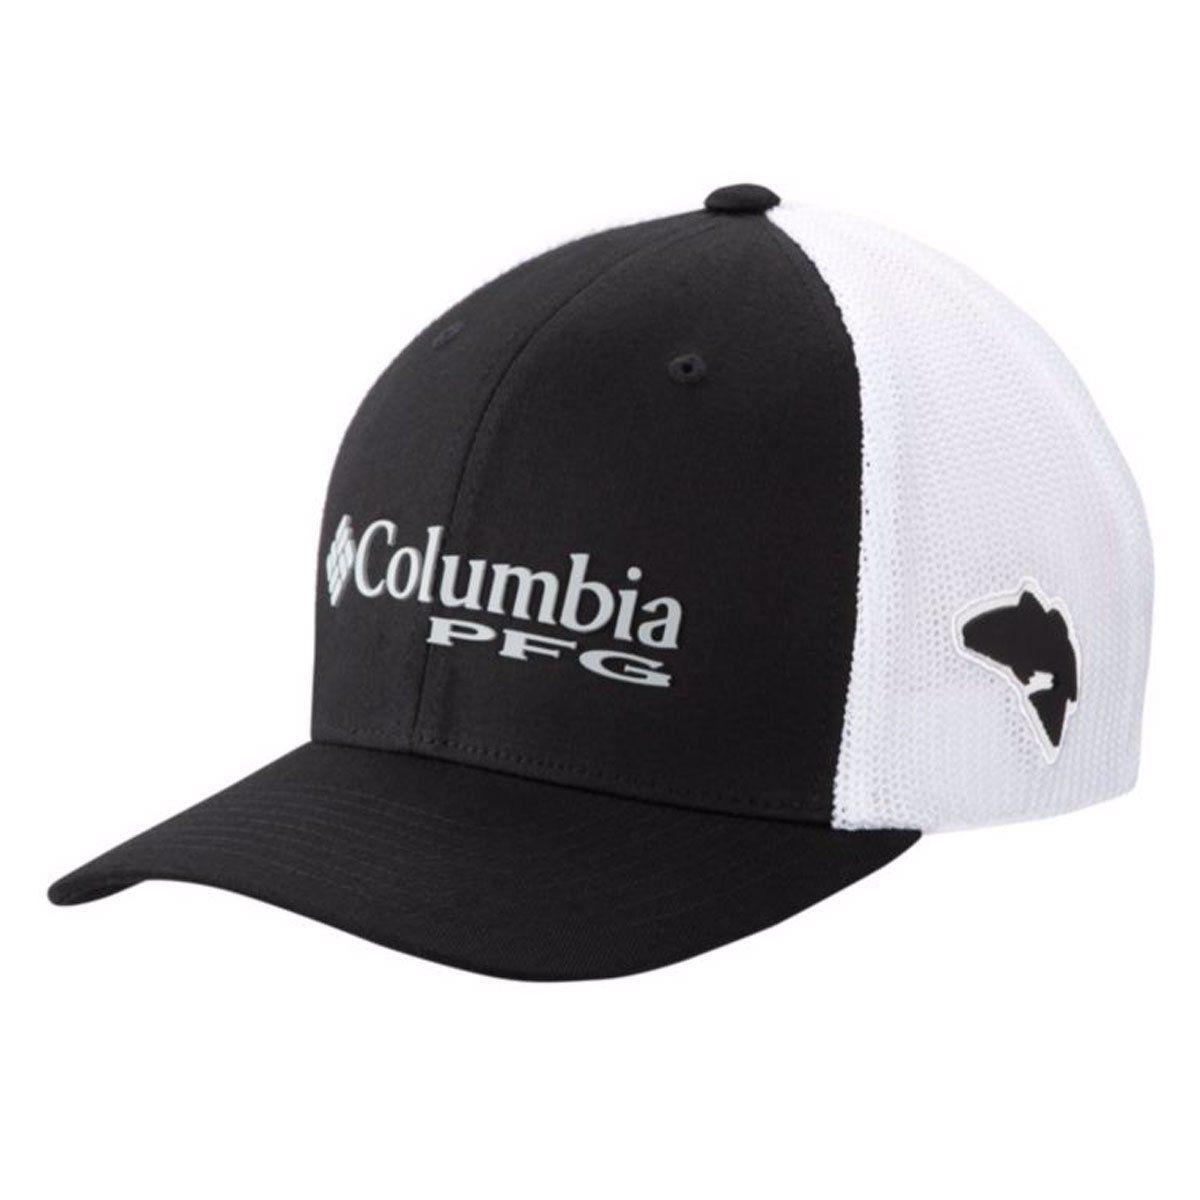 BONE COLUMBIA PFG MESH TM BALL CAP COLLEGIATE NAVY